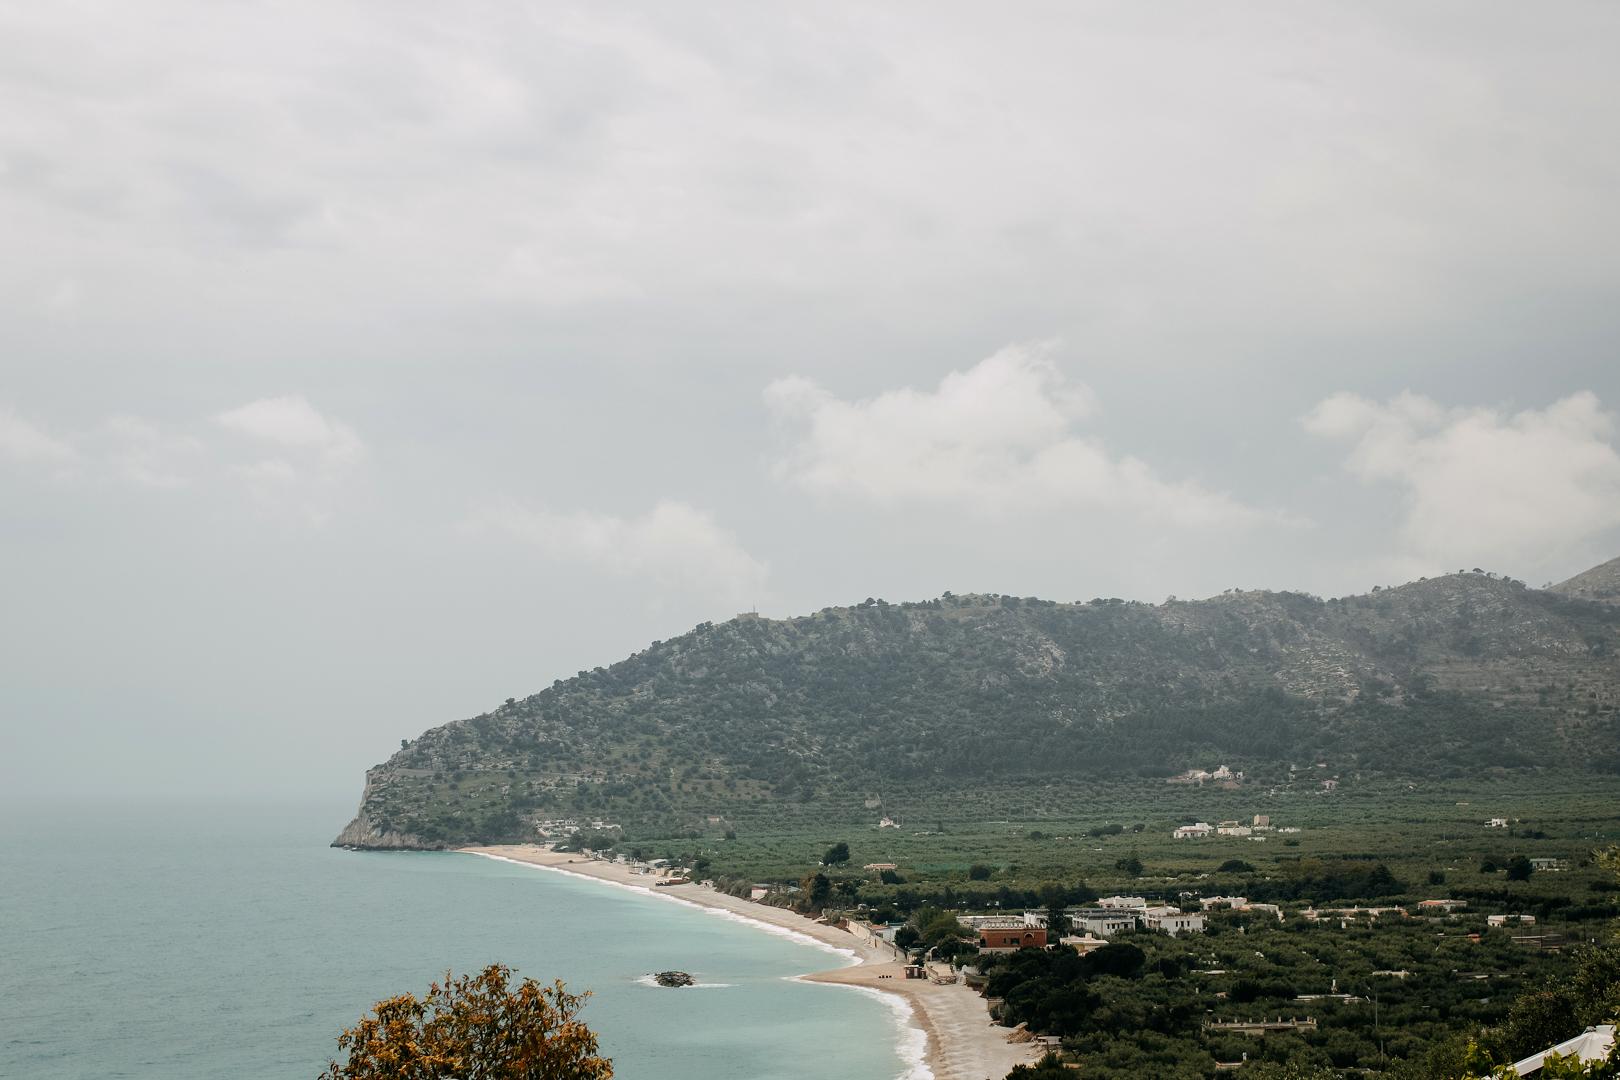 2 gargano-mattinata-il-porto-gianni-lepore-fotografo-lucera